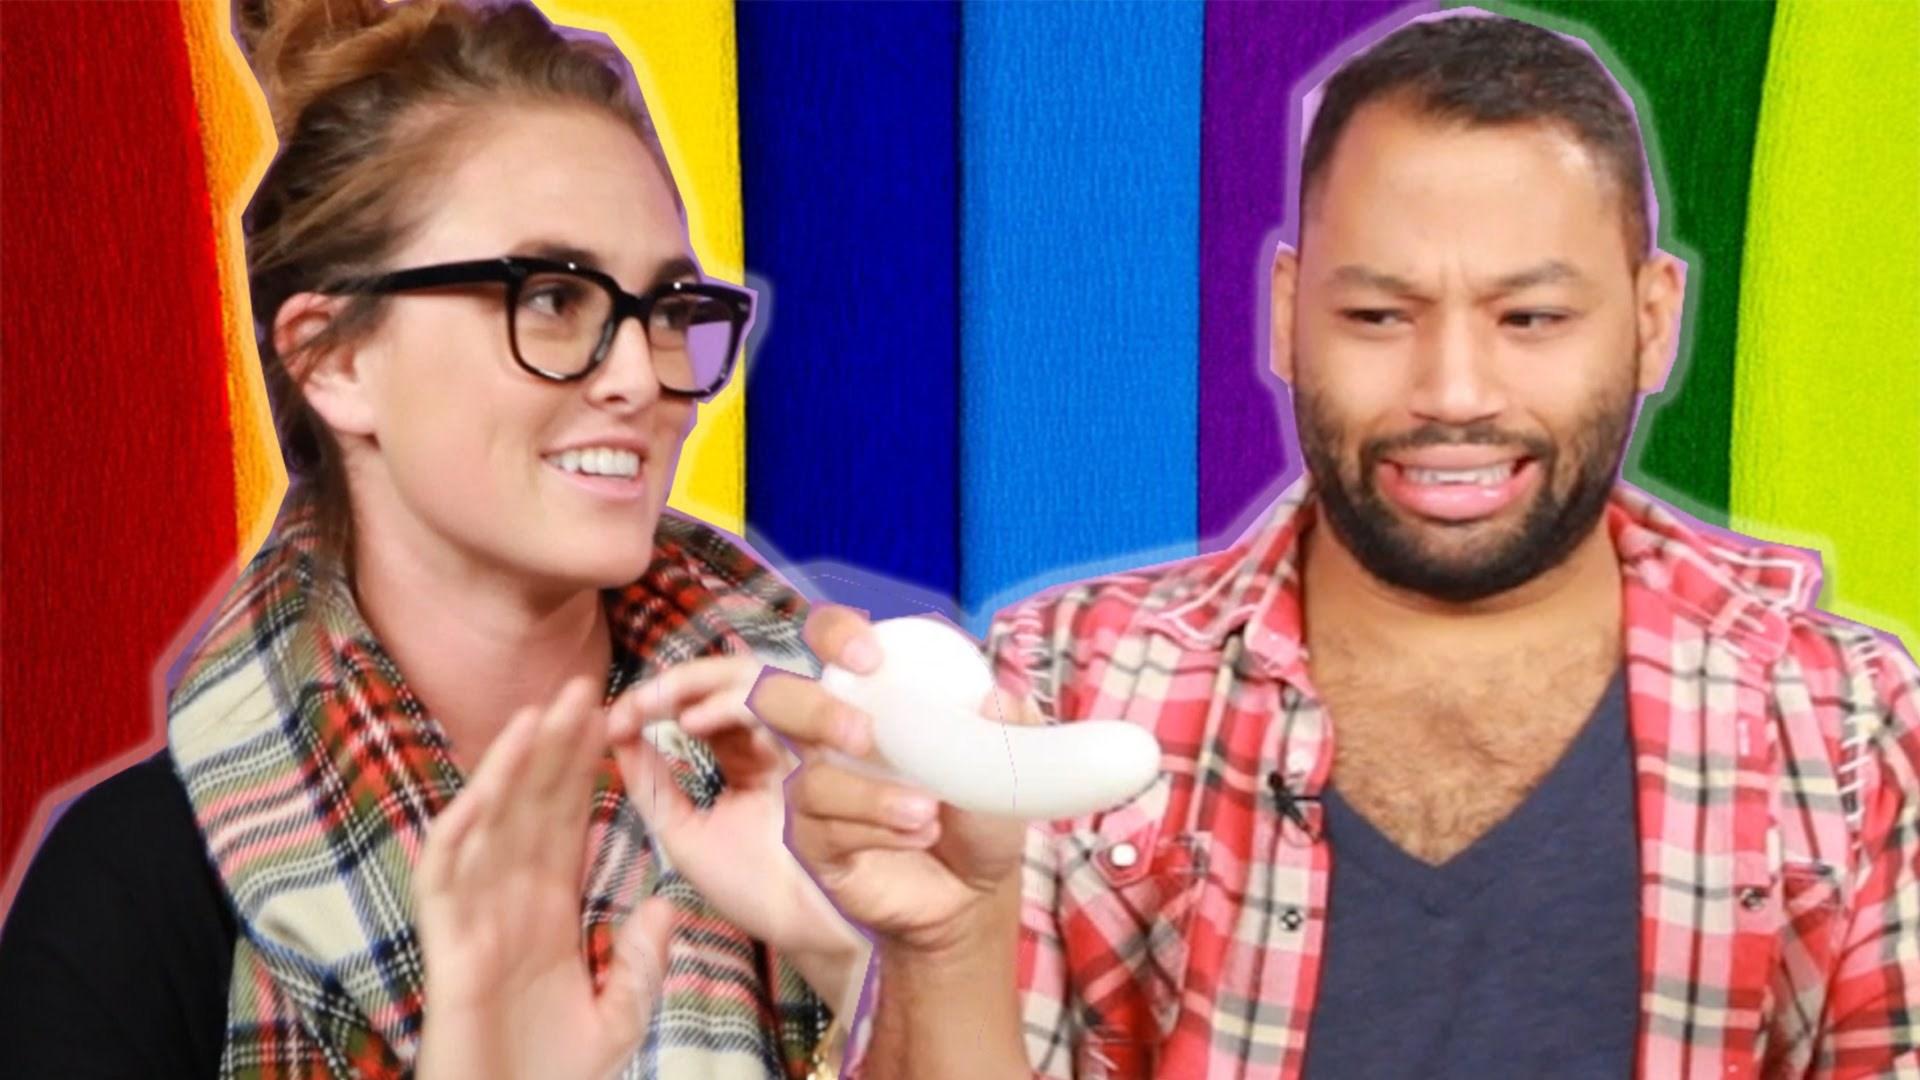 Galerija slika lezbijskog seksa